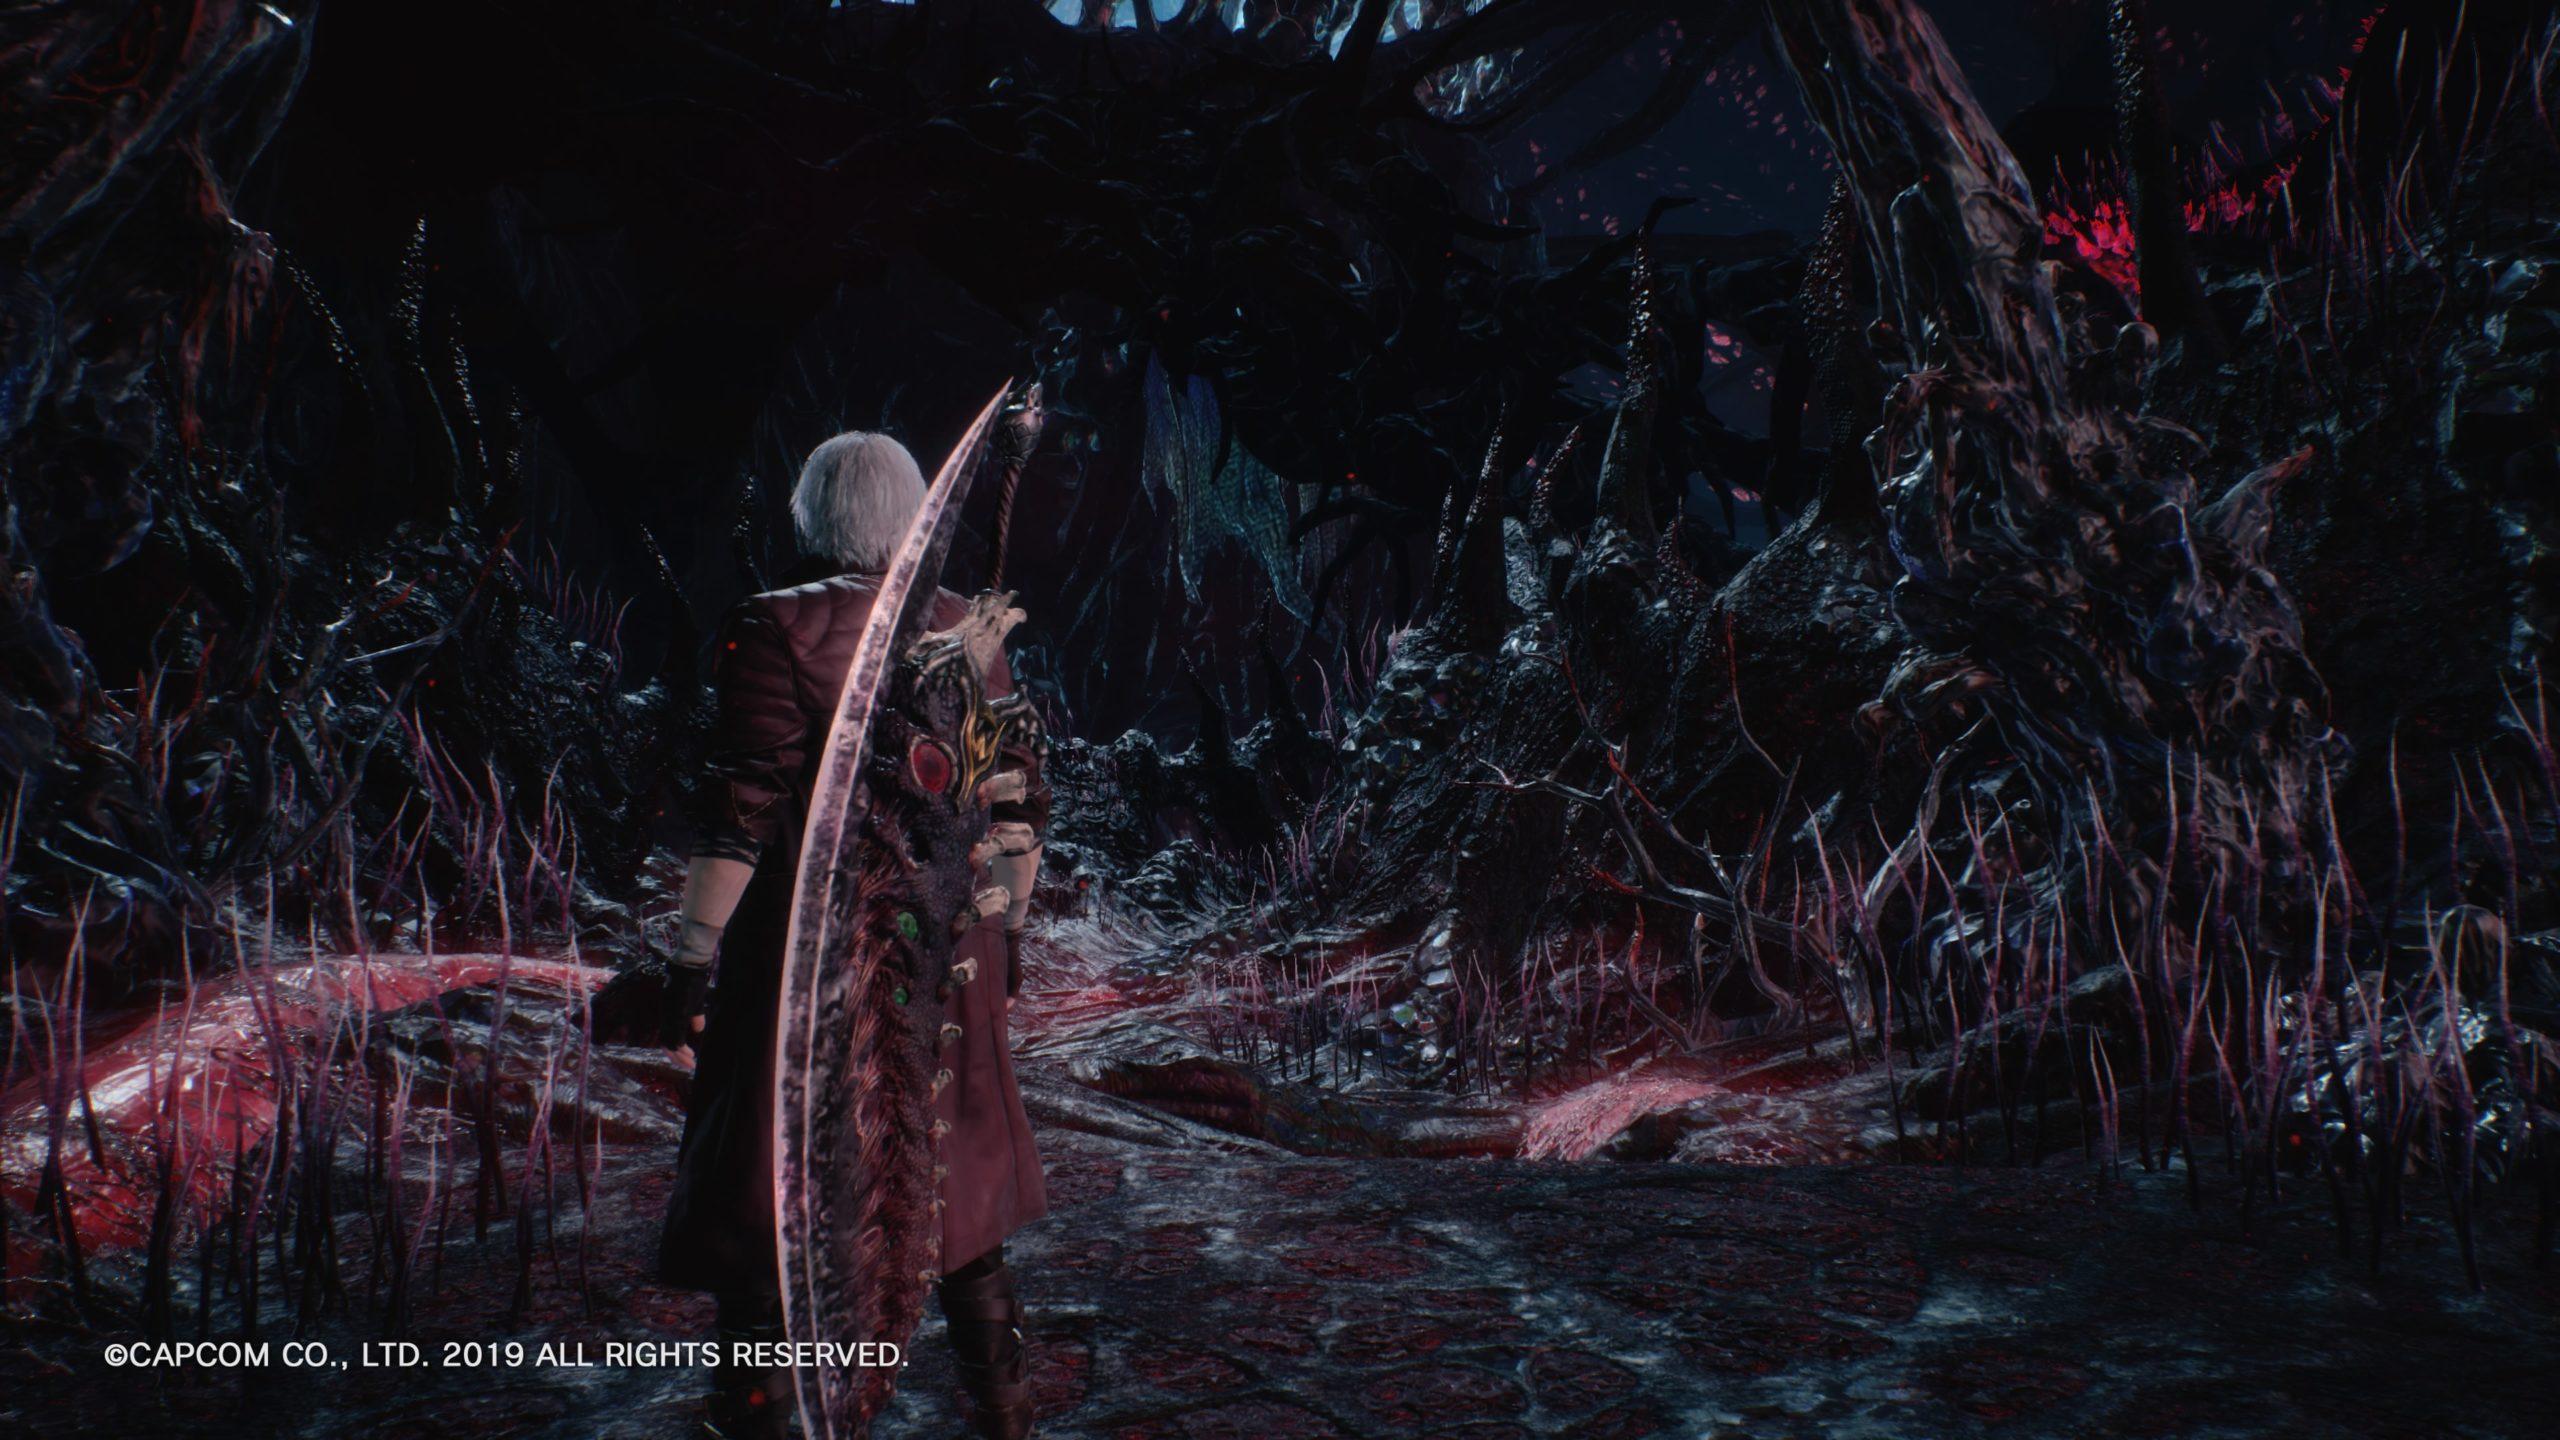 【Devil May Cry5】ファン待望の新作!いかにカッコよく戦えるか!【アクション】【レビュー】